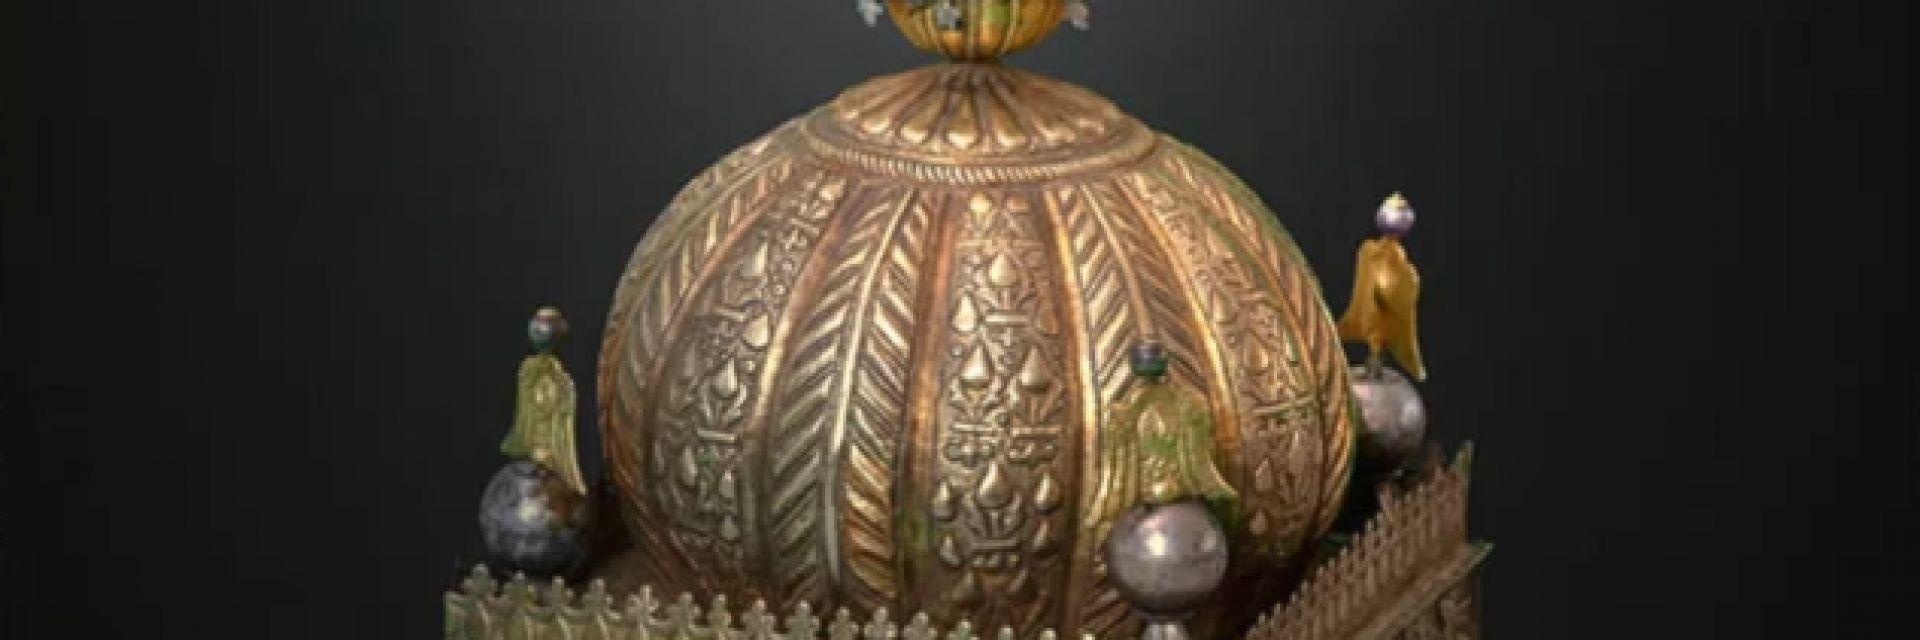 Появи се безценна етиопска корона, укривана 21 години